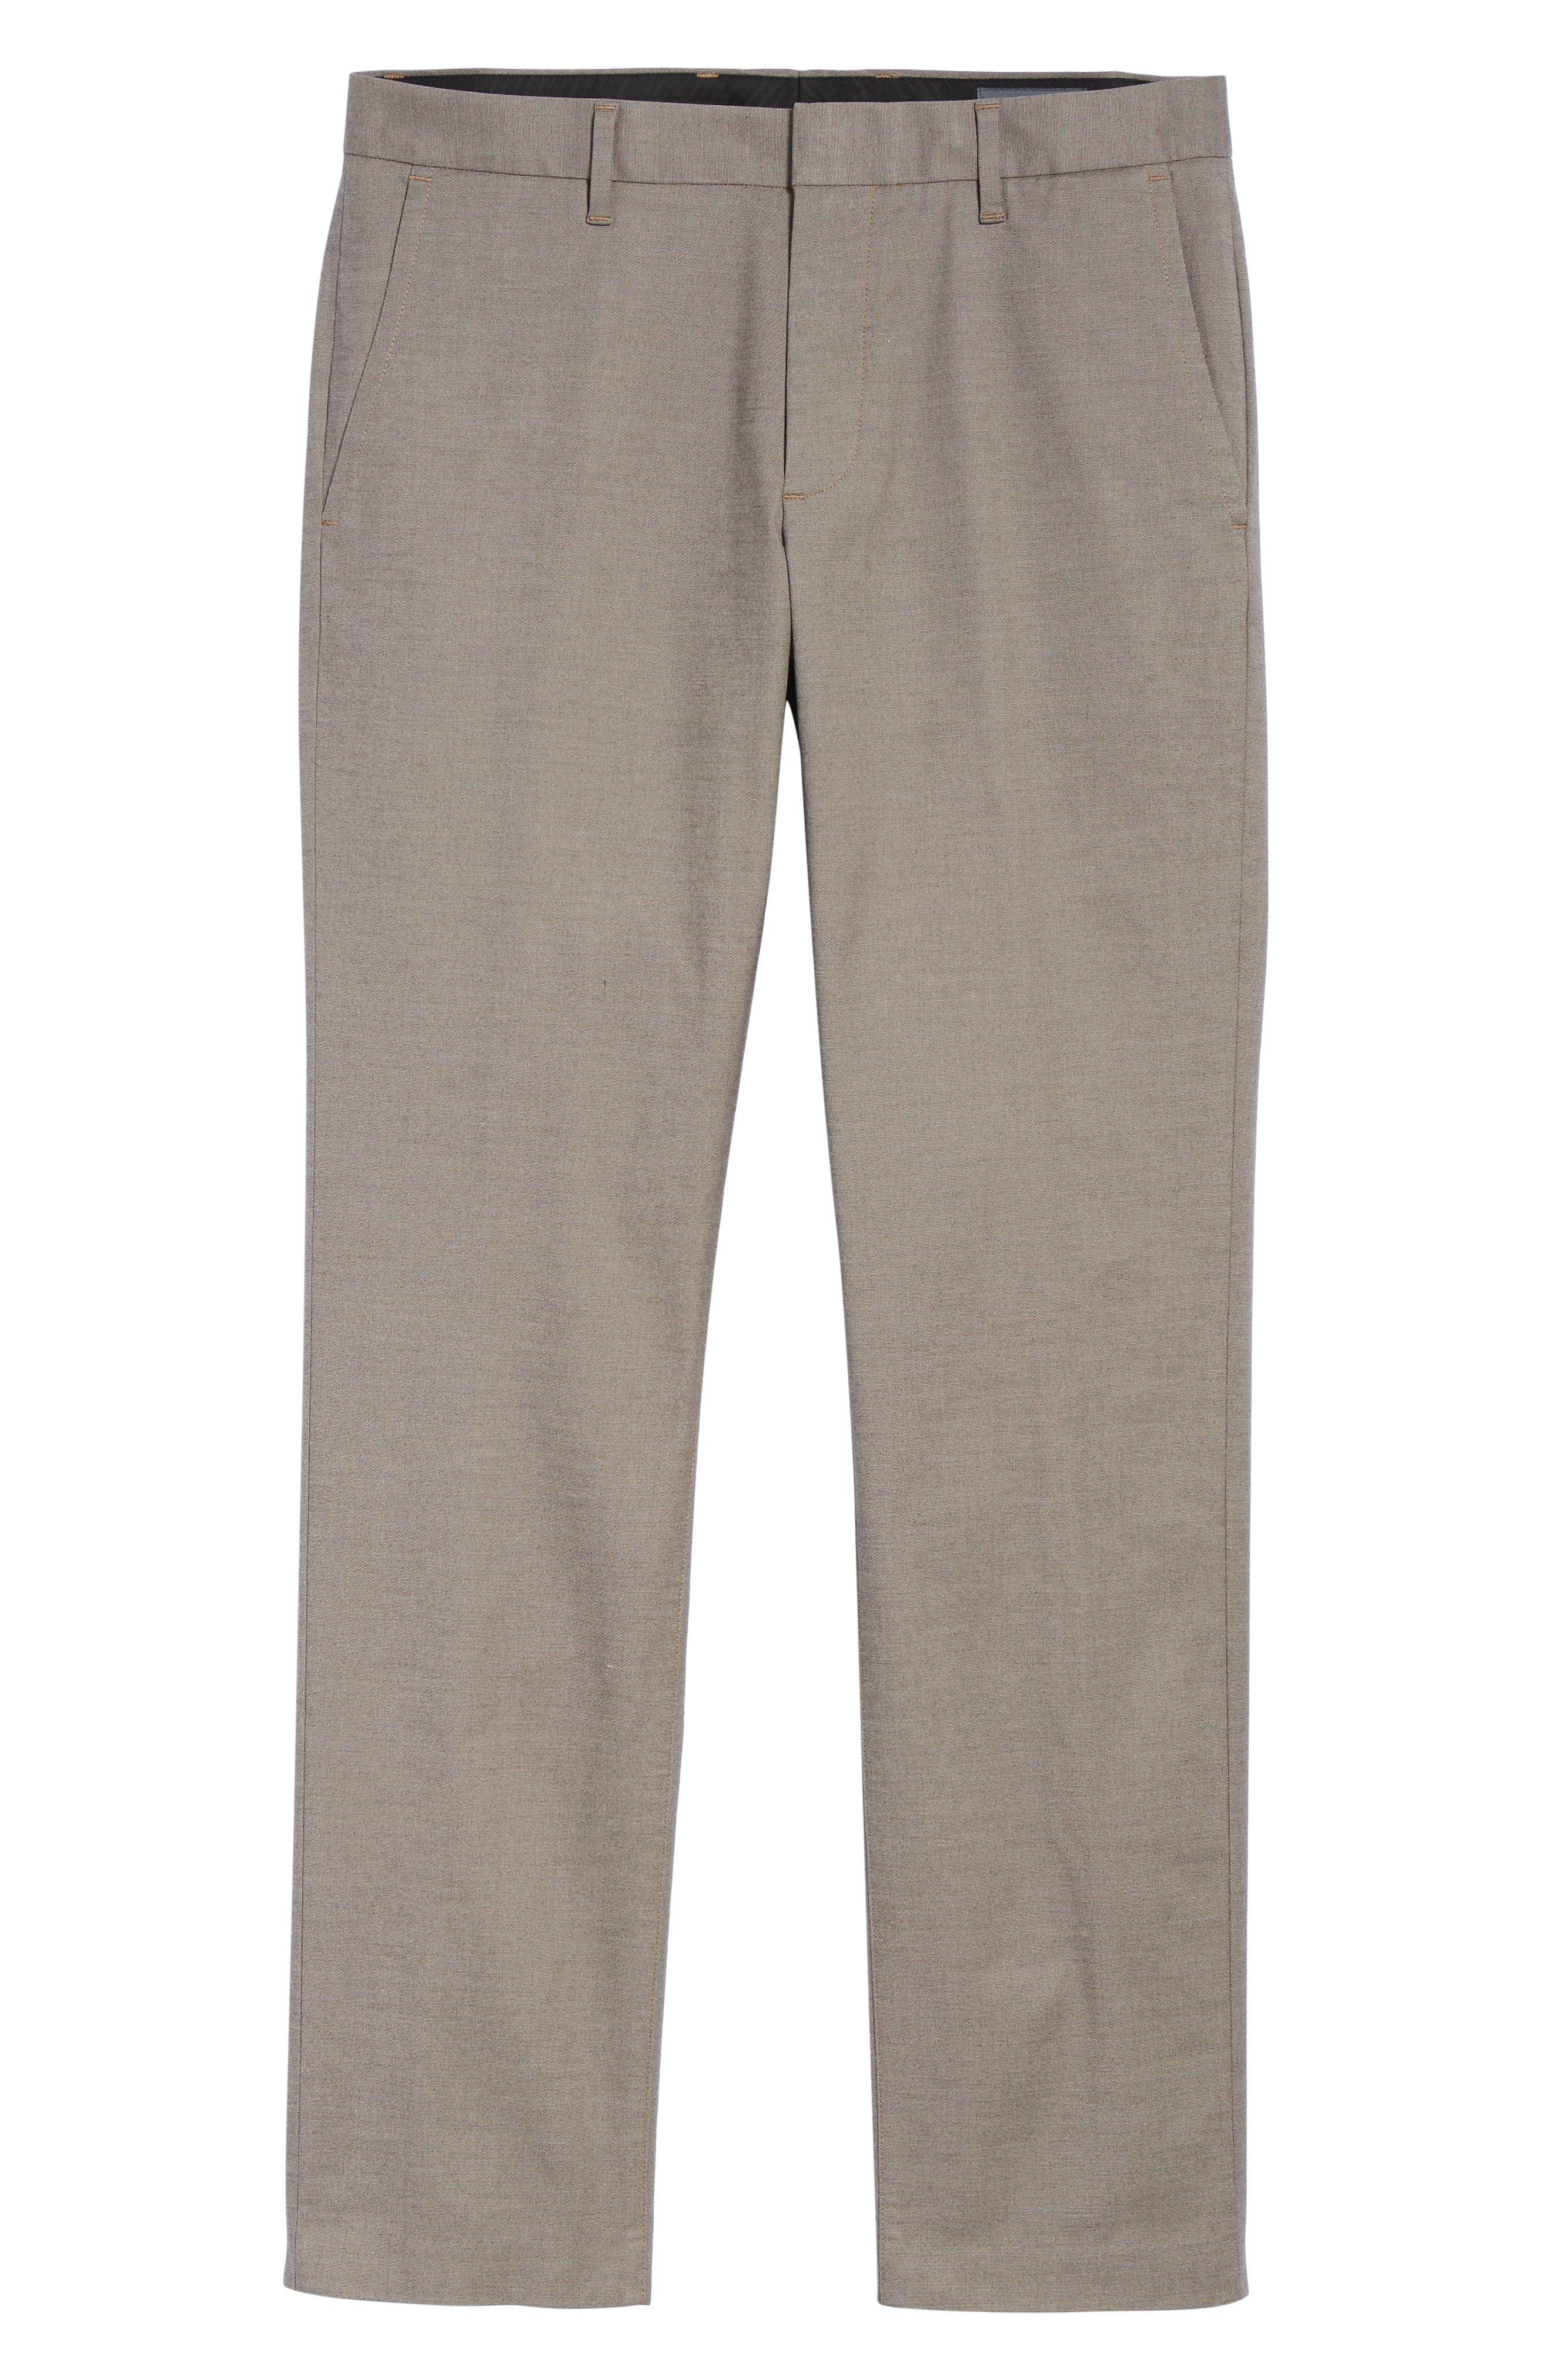 BONOBOS, Weekday Warrior Slim Fit Stretch Dress Pants, Alternate thumbnail 7, color, LIGHT KHAKI YARN DYE